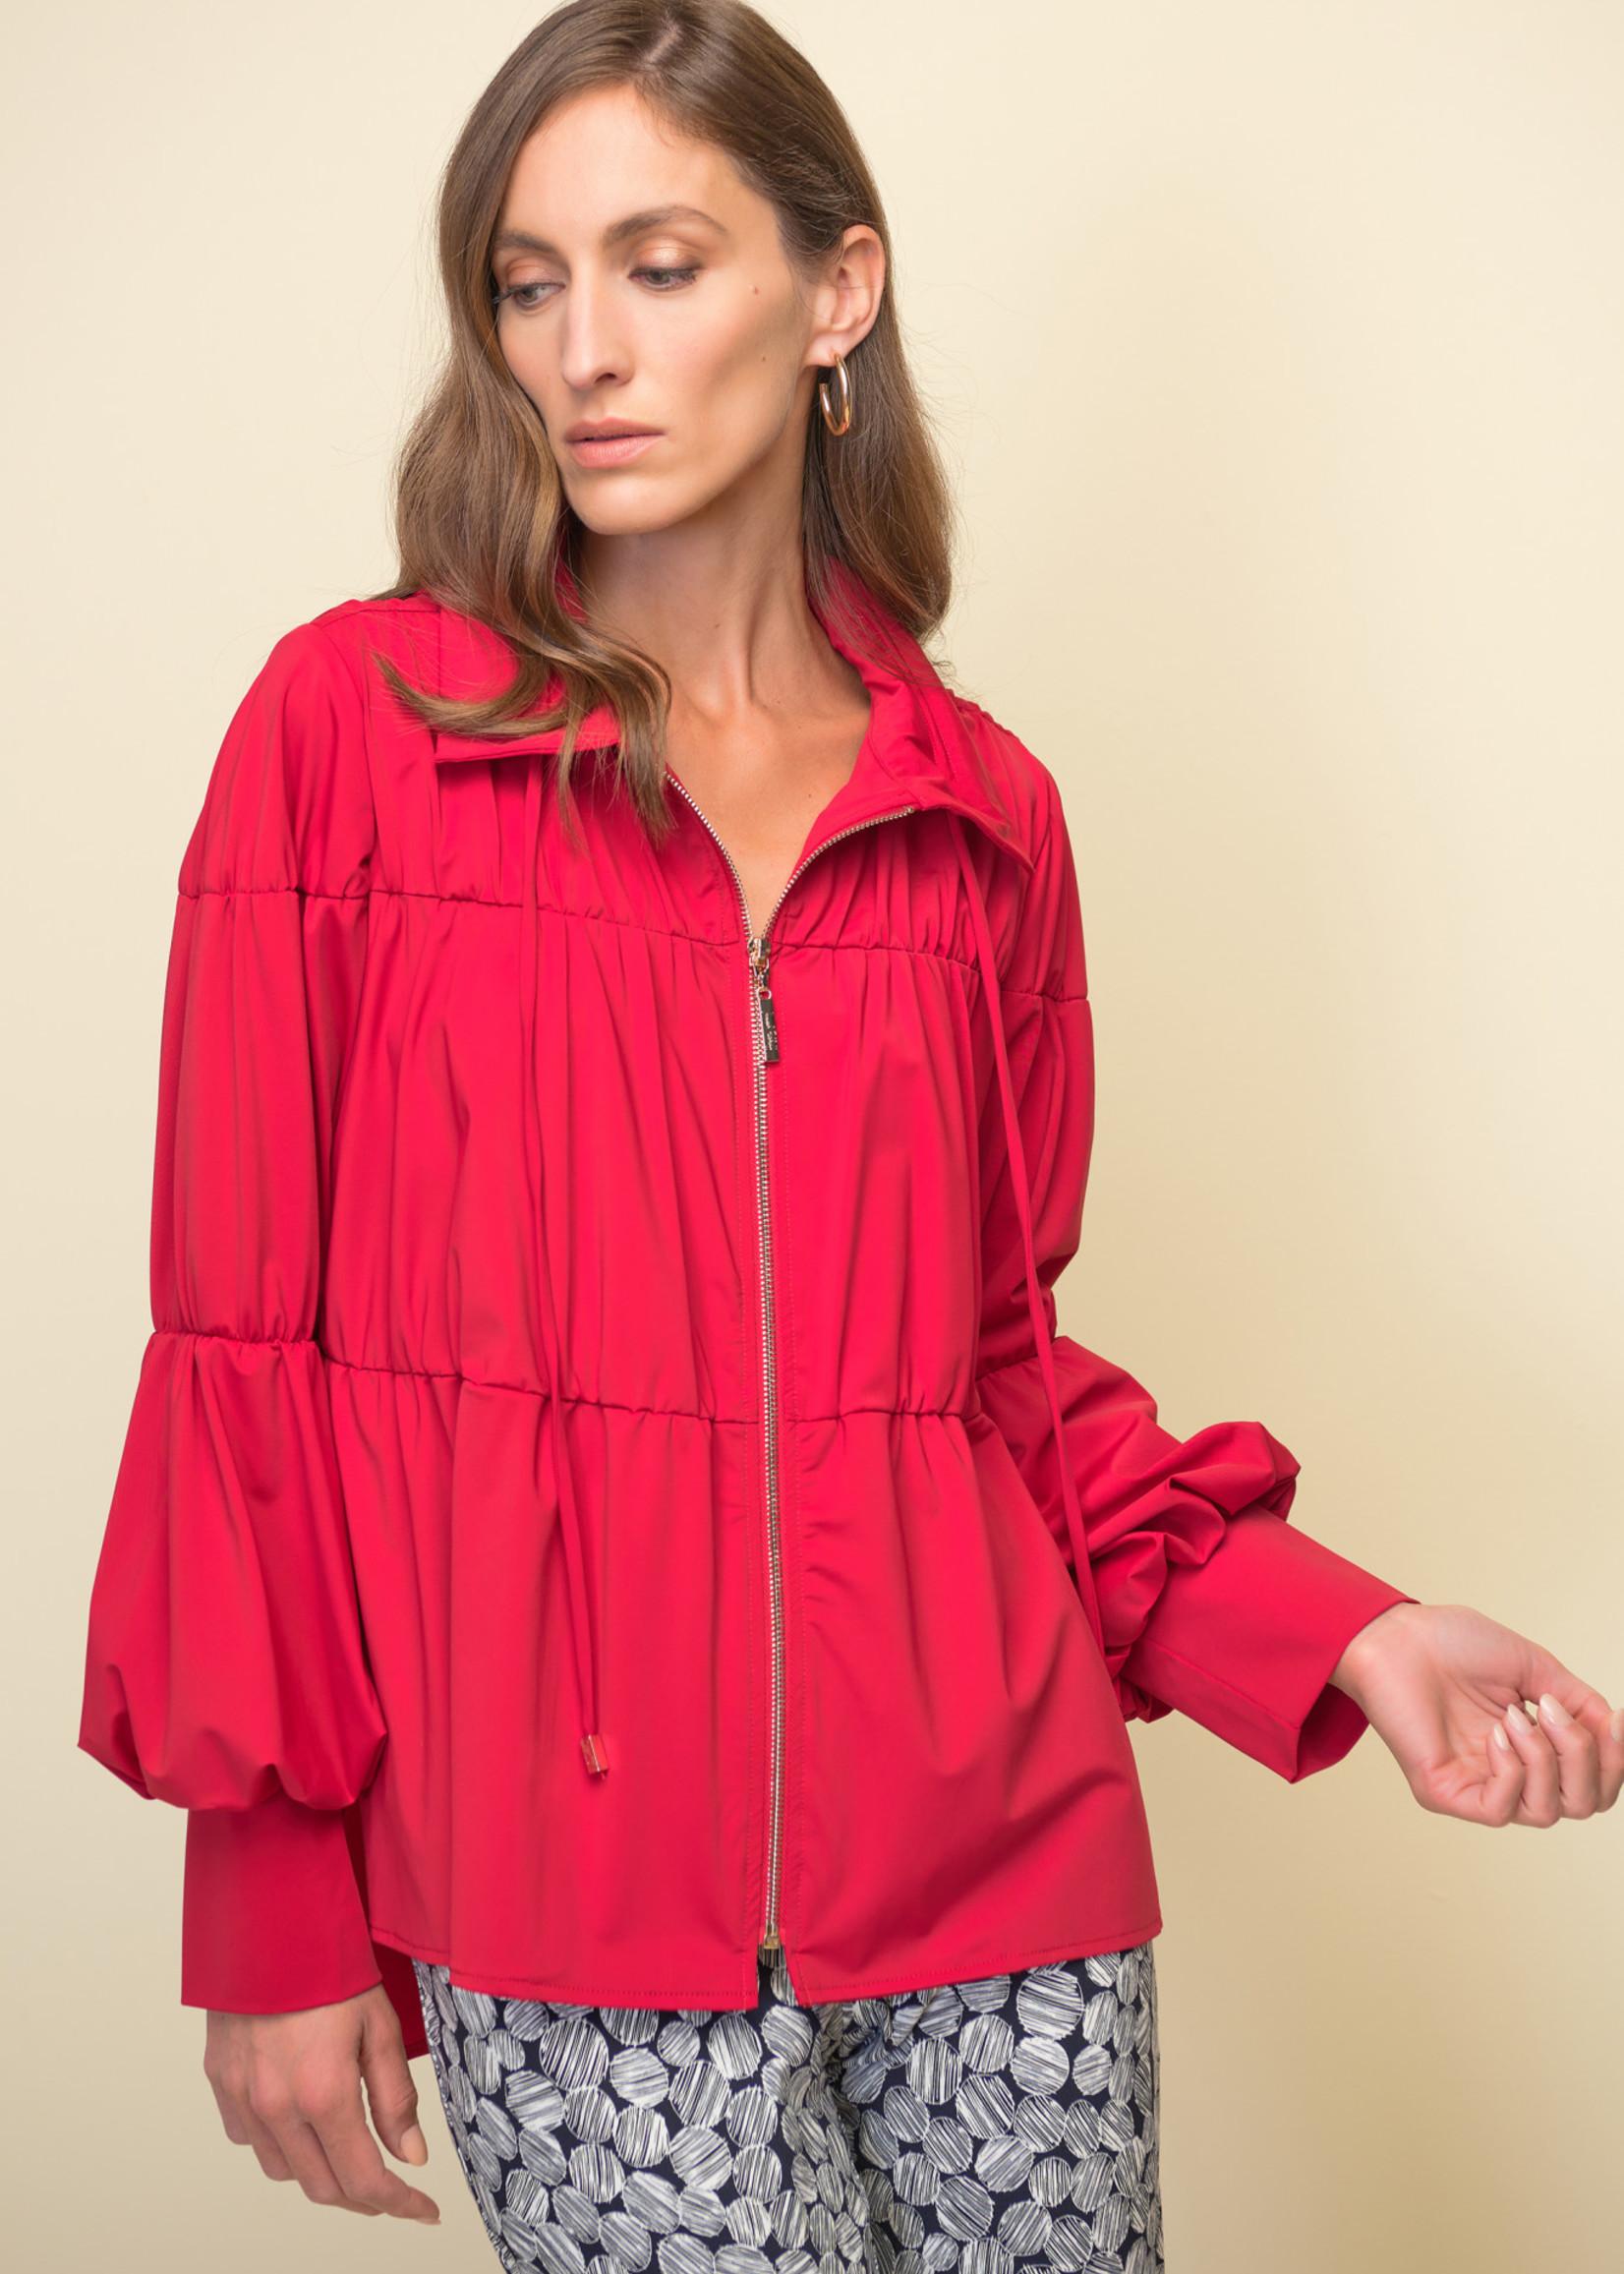 Joseph Ribkoff Joseph Ribkoff Red Puffed Sleeve Jacket